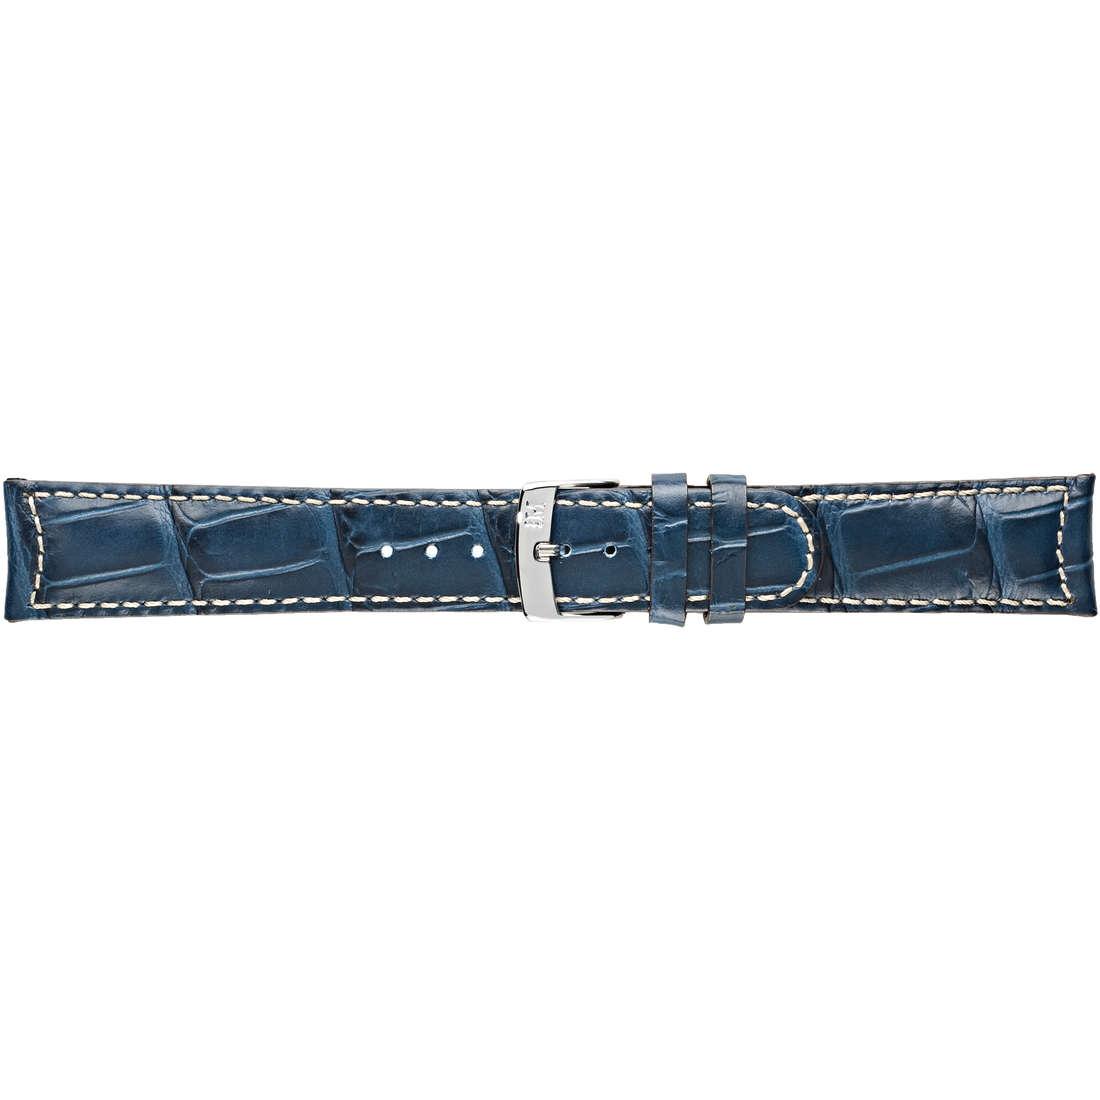 watch watch bands watch straps man Morellato Manufatti A01U3882A59064CR18